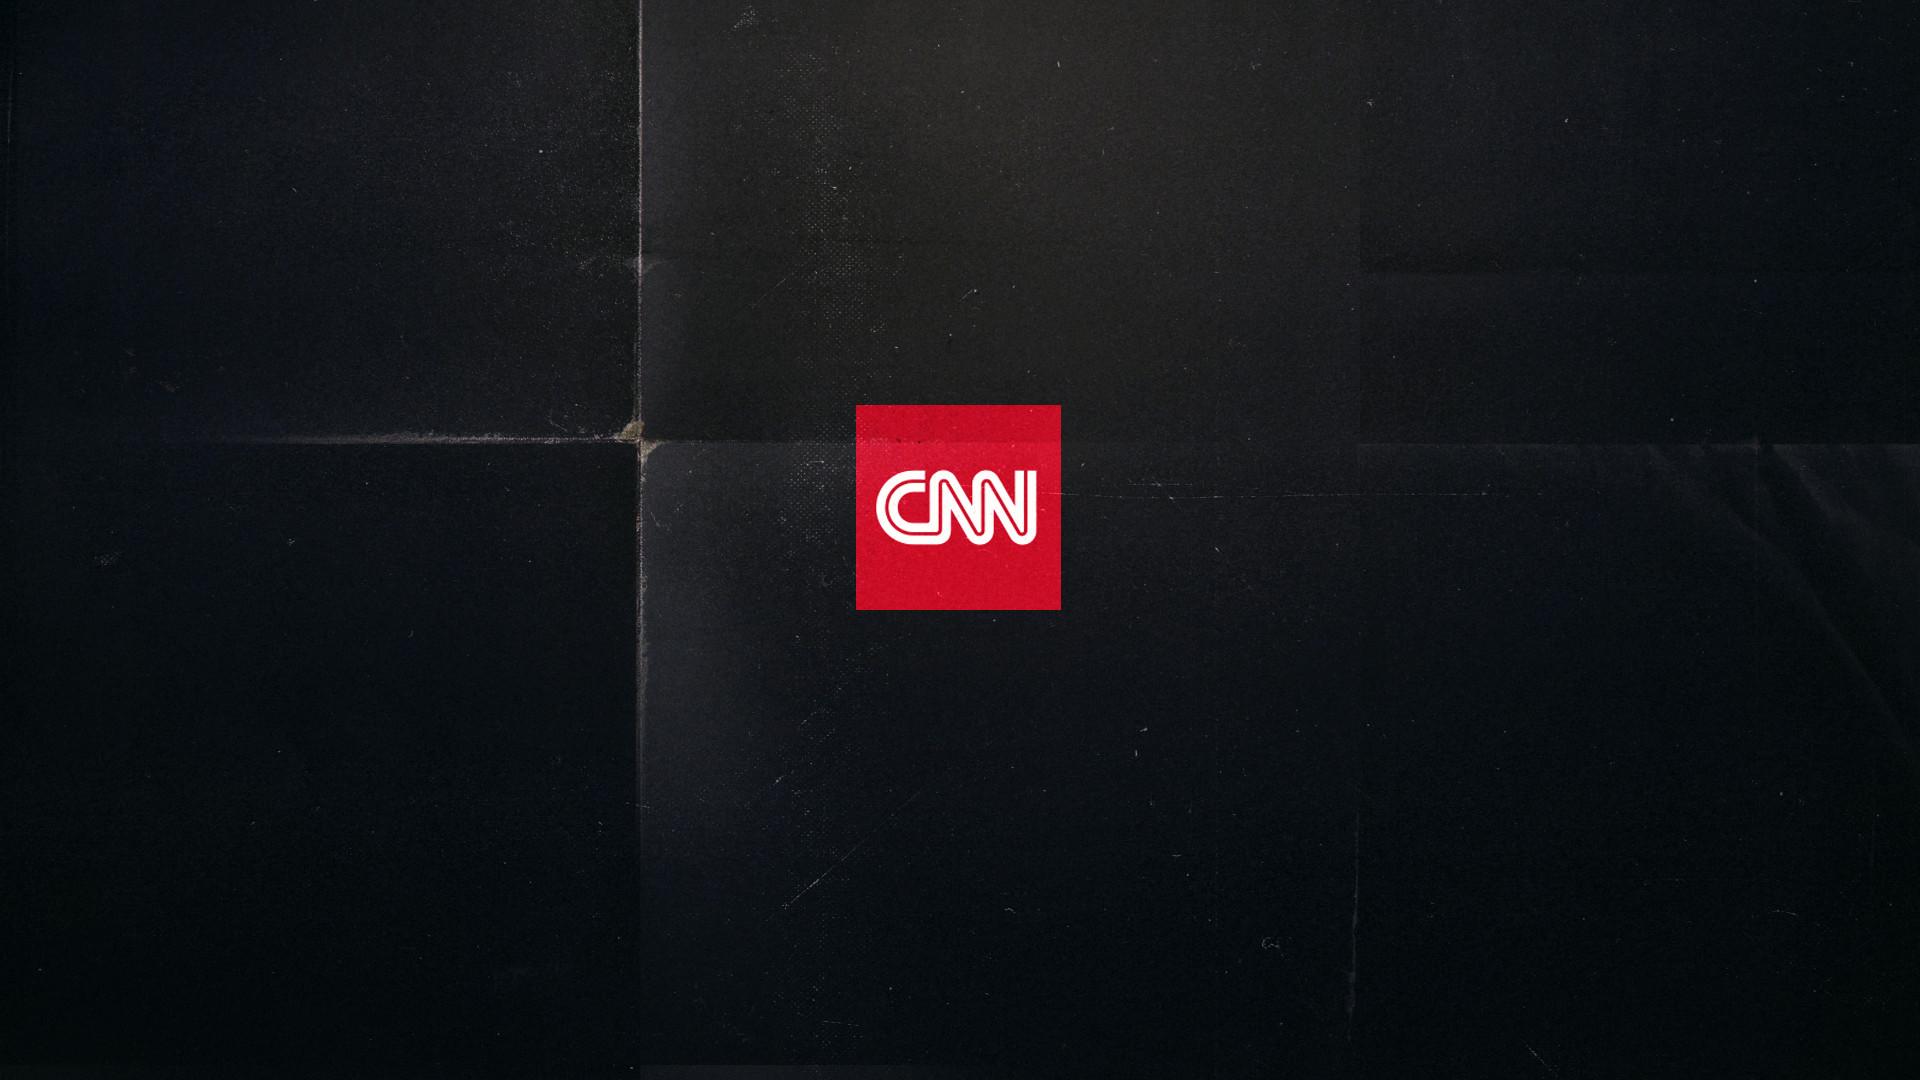 CNN_Sndtrks_CNN_01.jpg